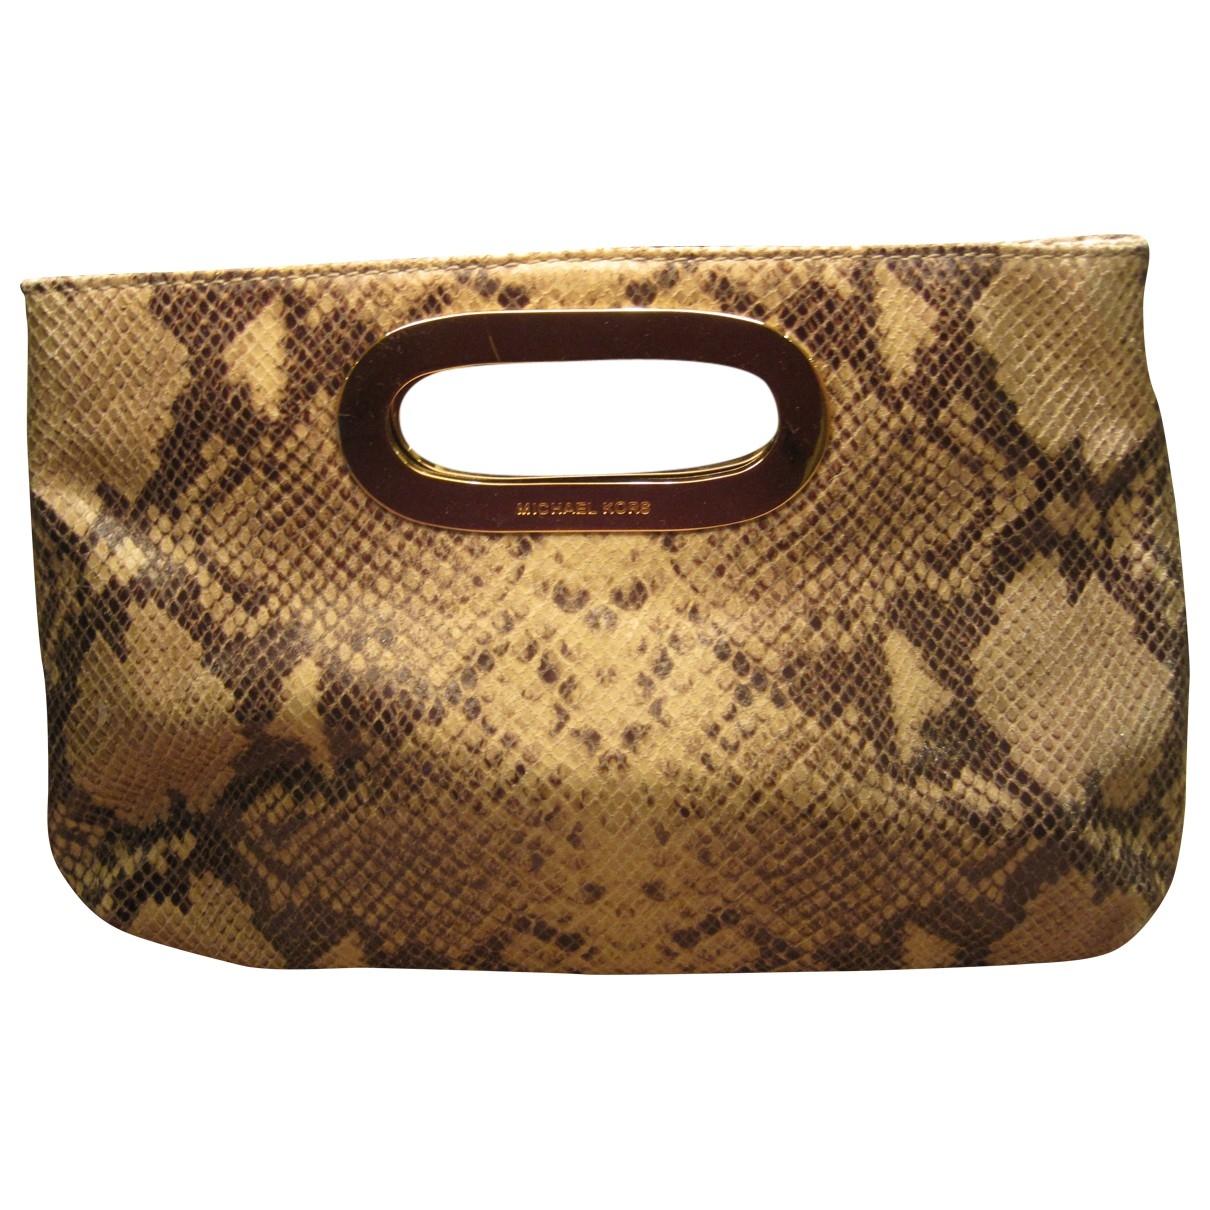 Michael Kors \N Beige Python Clutch bag for Women \N